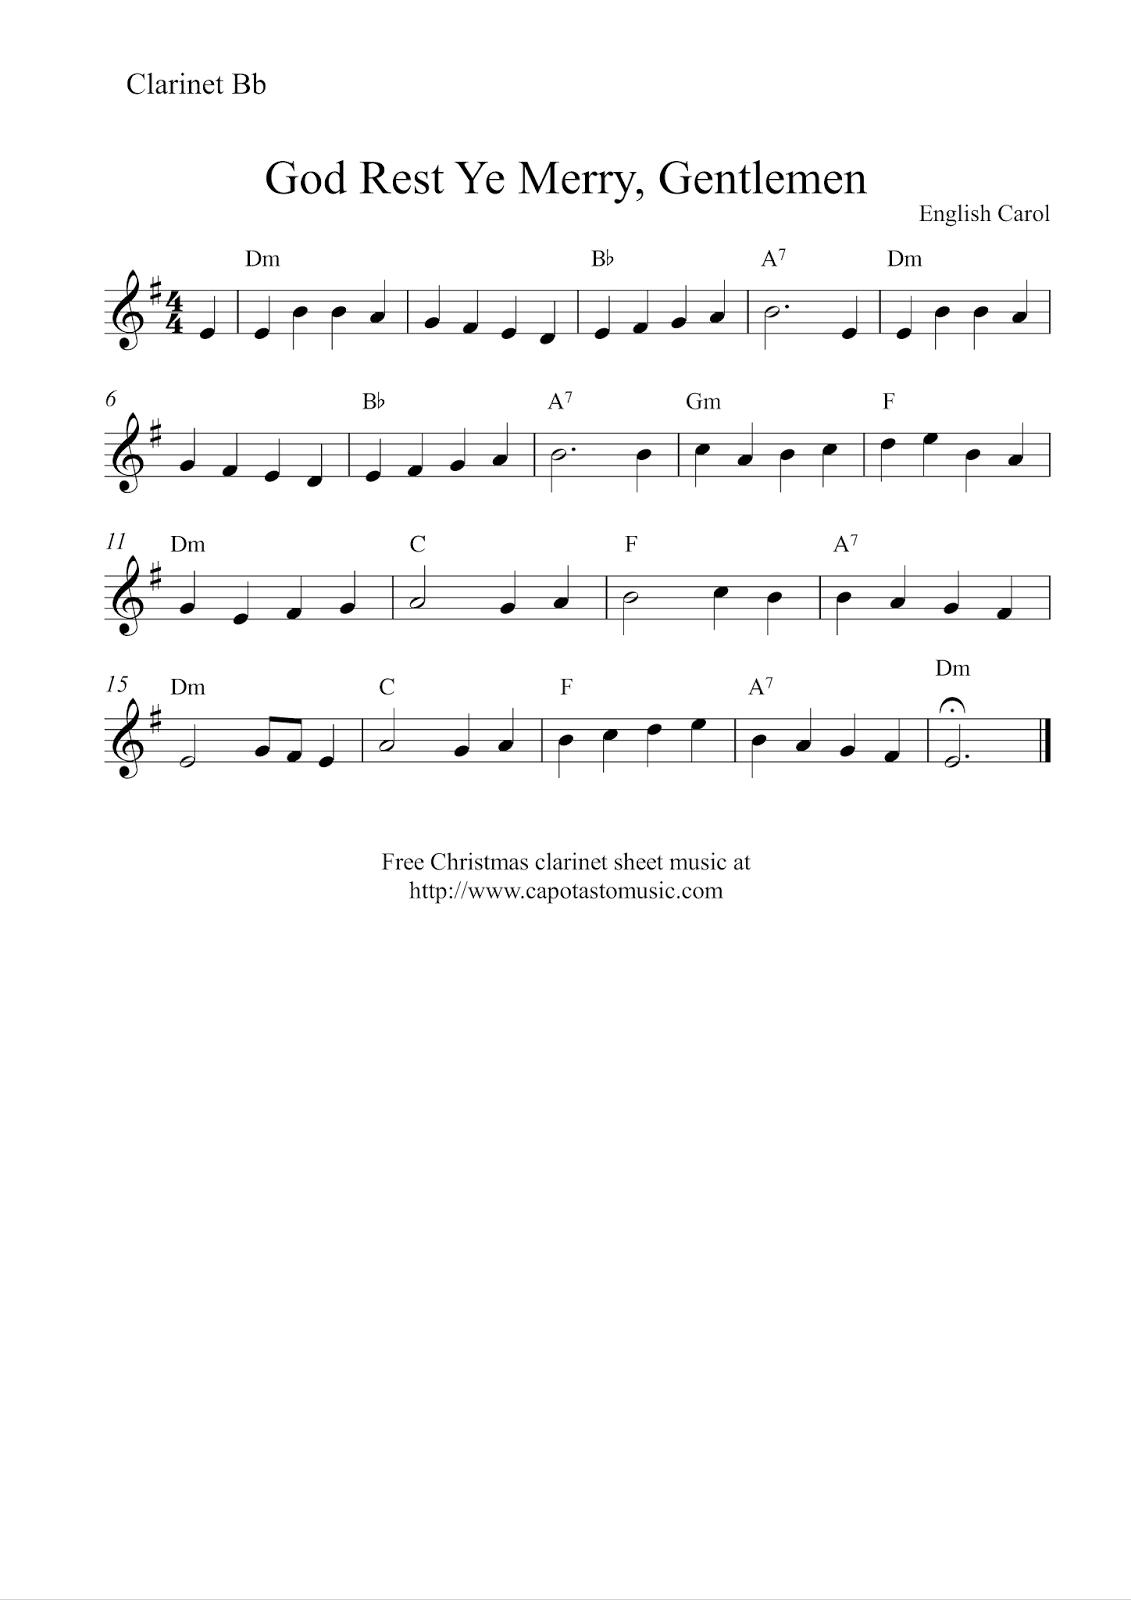 Free Printable Christmas Sheet Music For Clarinet